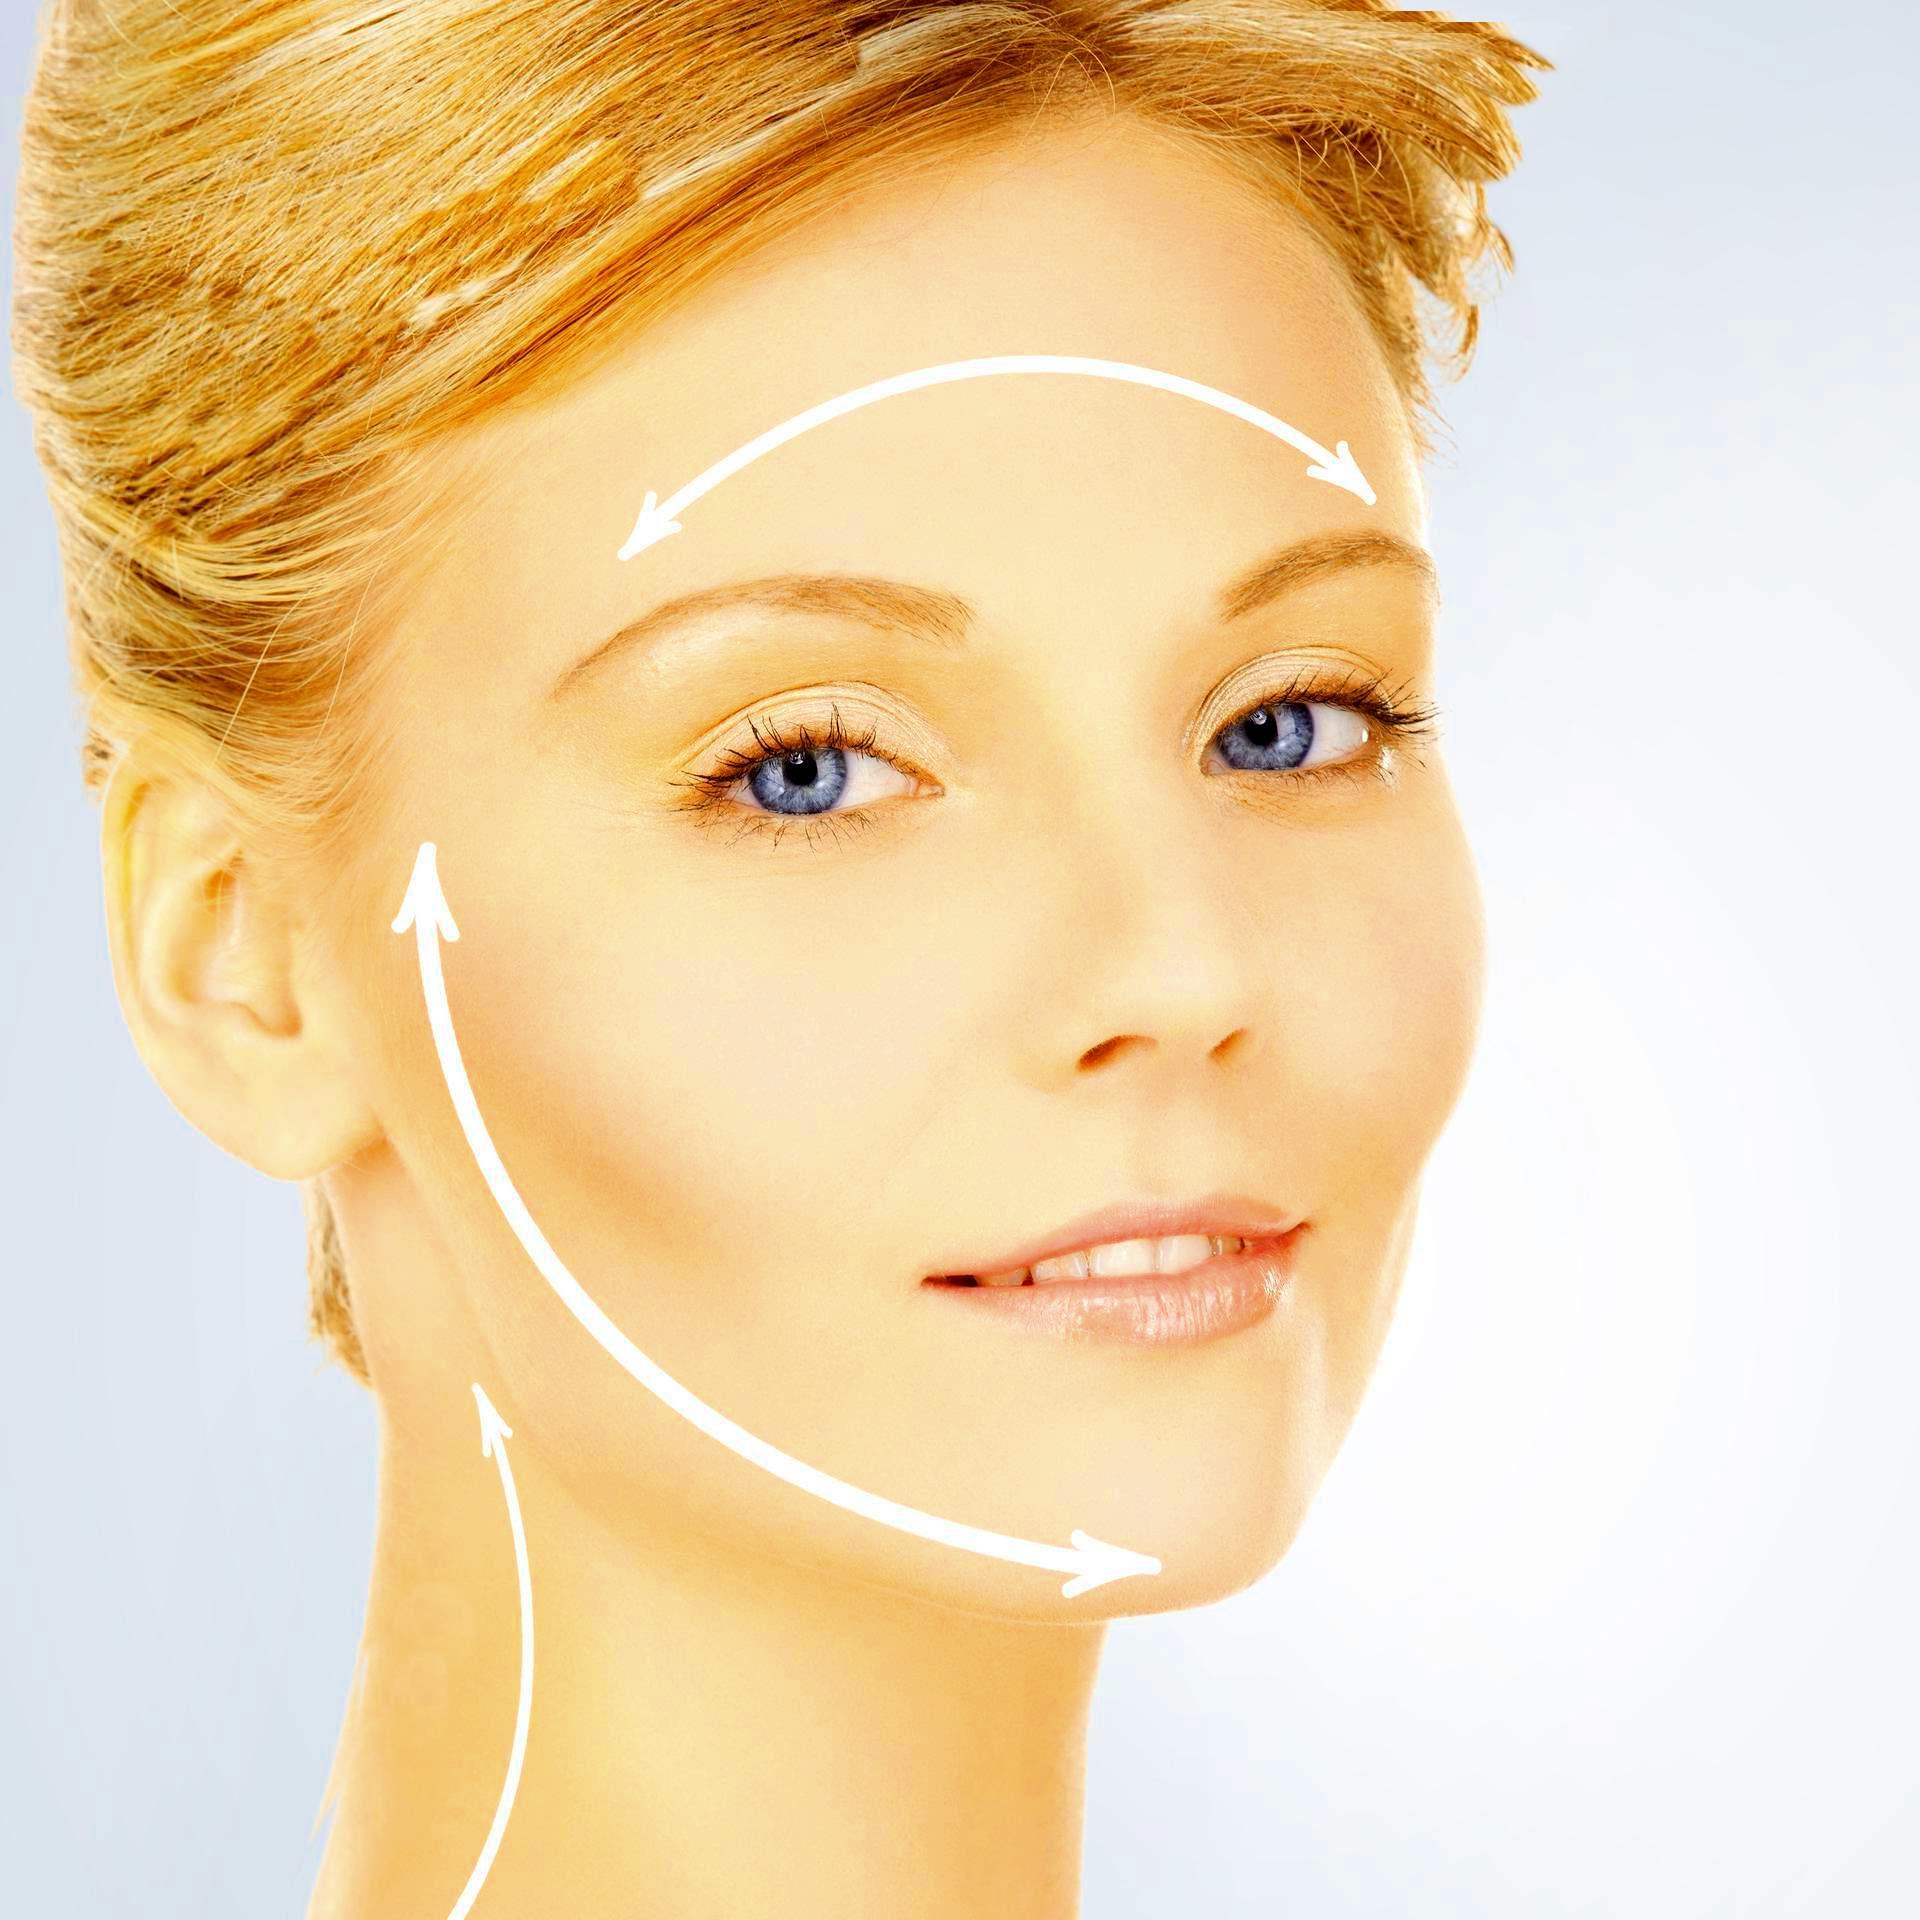 Рисунок линий для подтяжки кожи лица